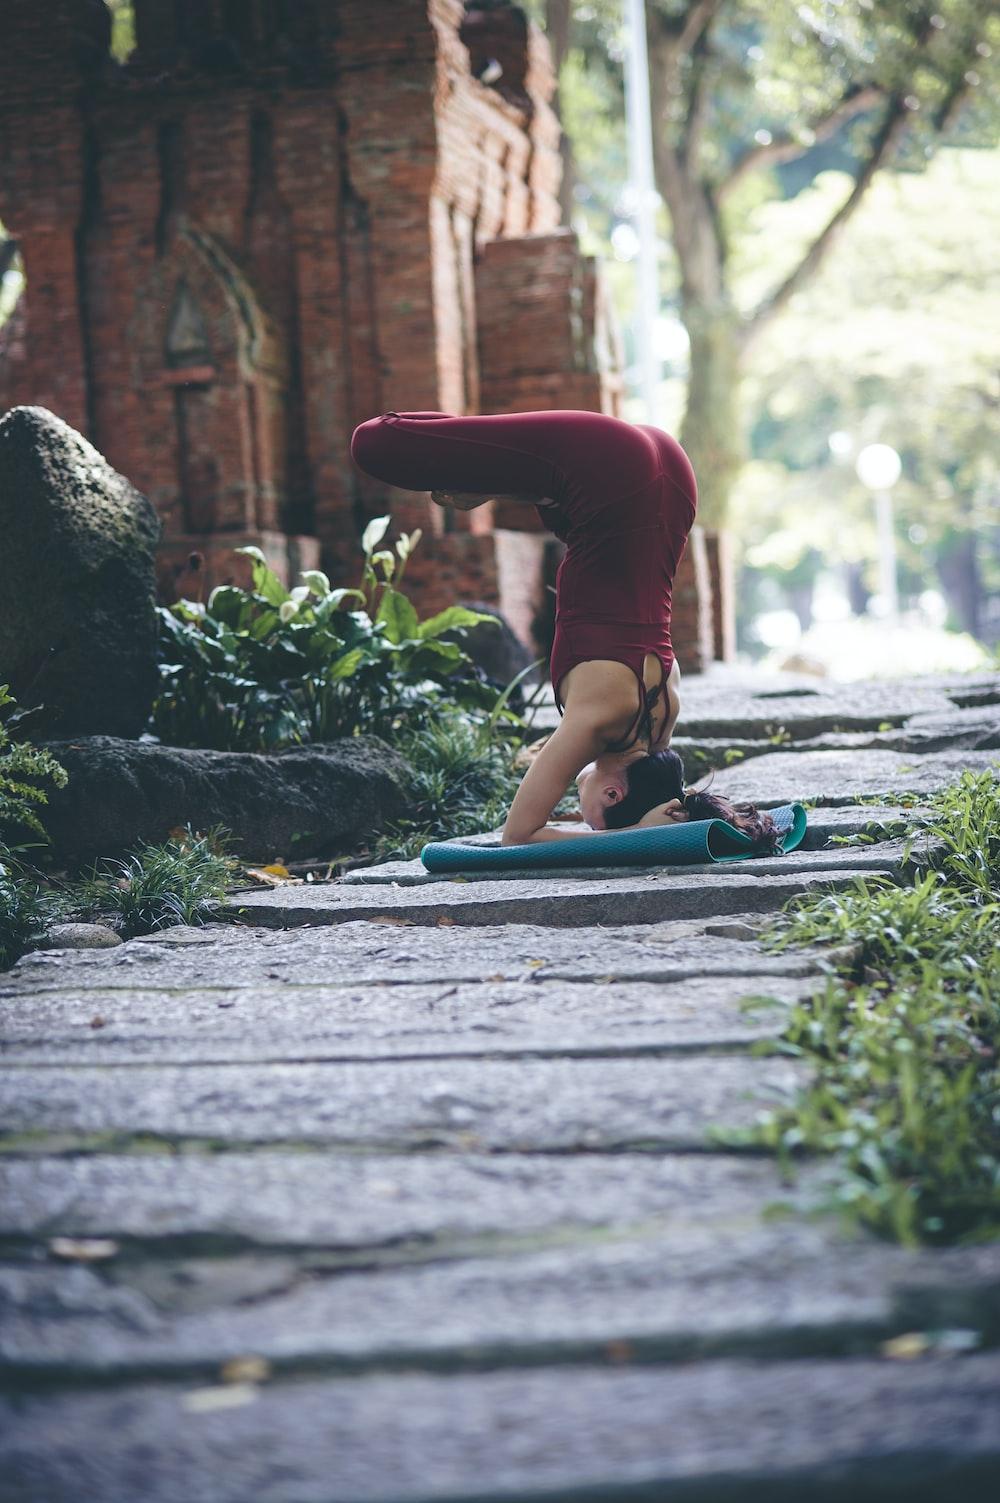 woman doing yoga pose outdoors